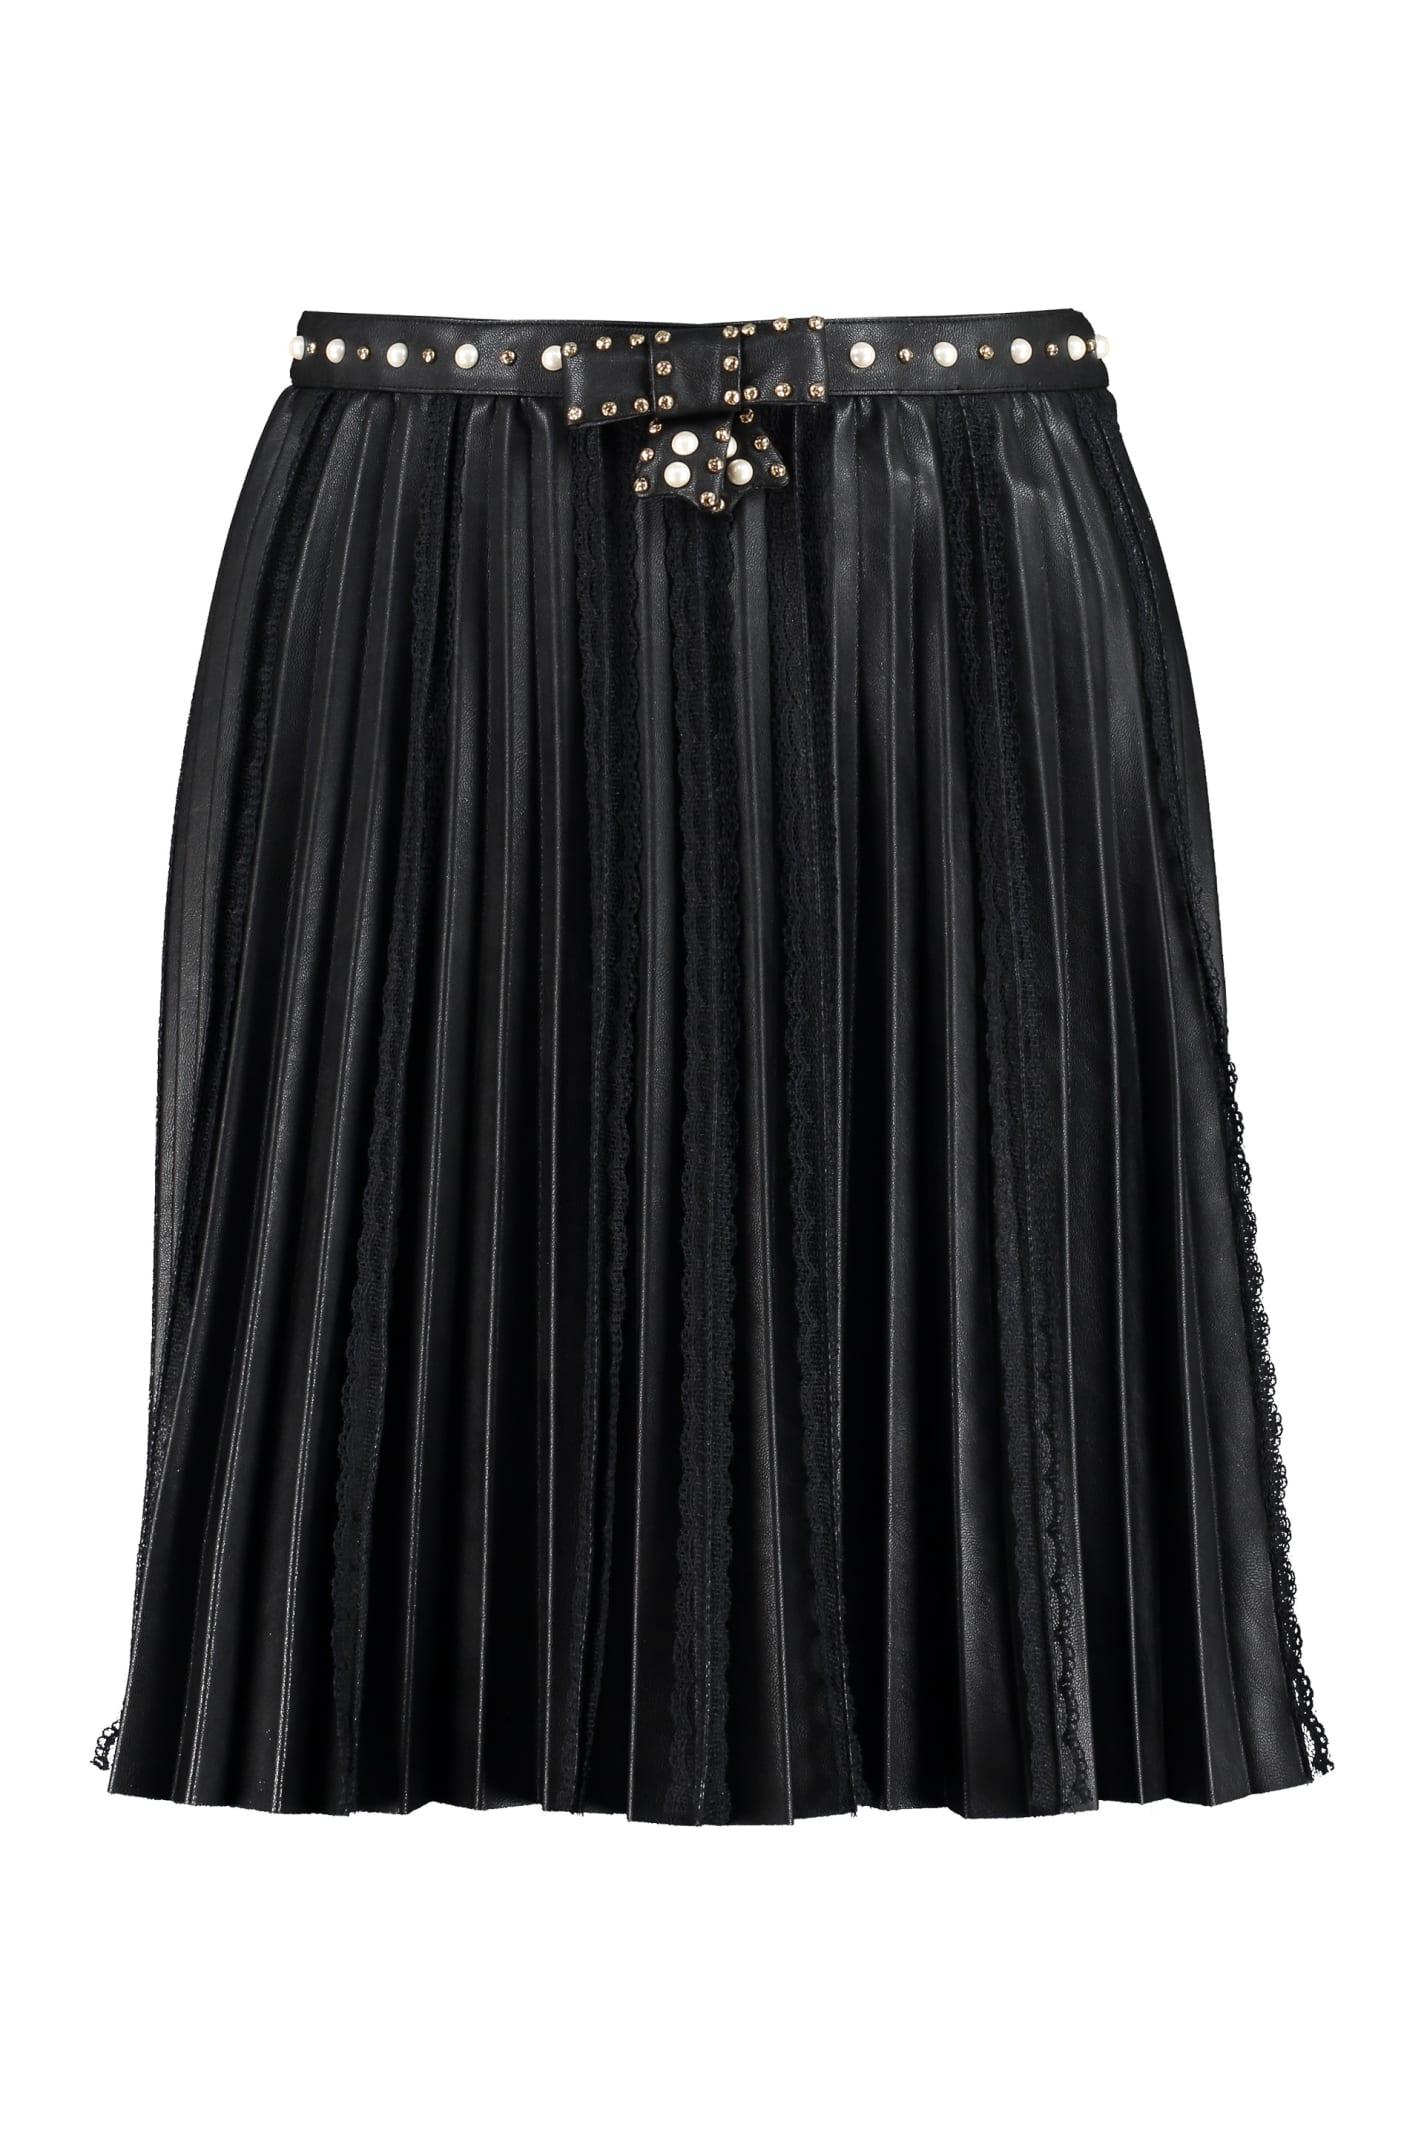 Elisabetta Franchi Faux Leather Pleated Mini Skirt